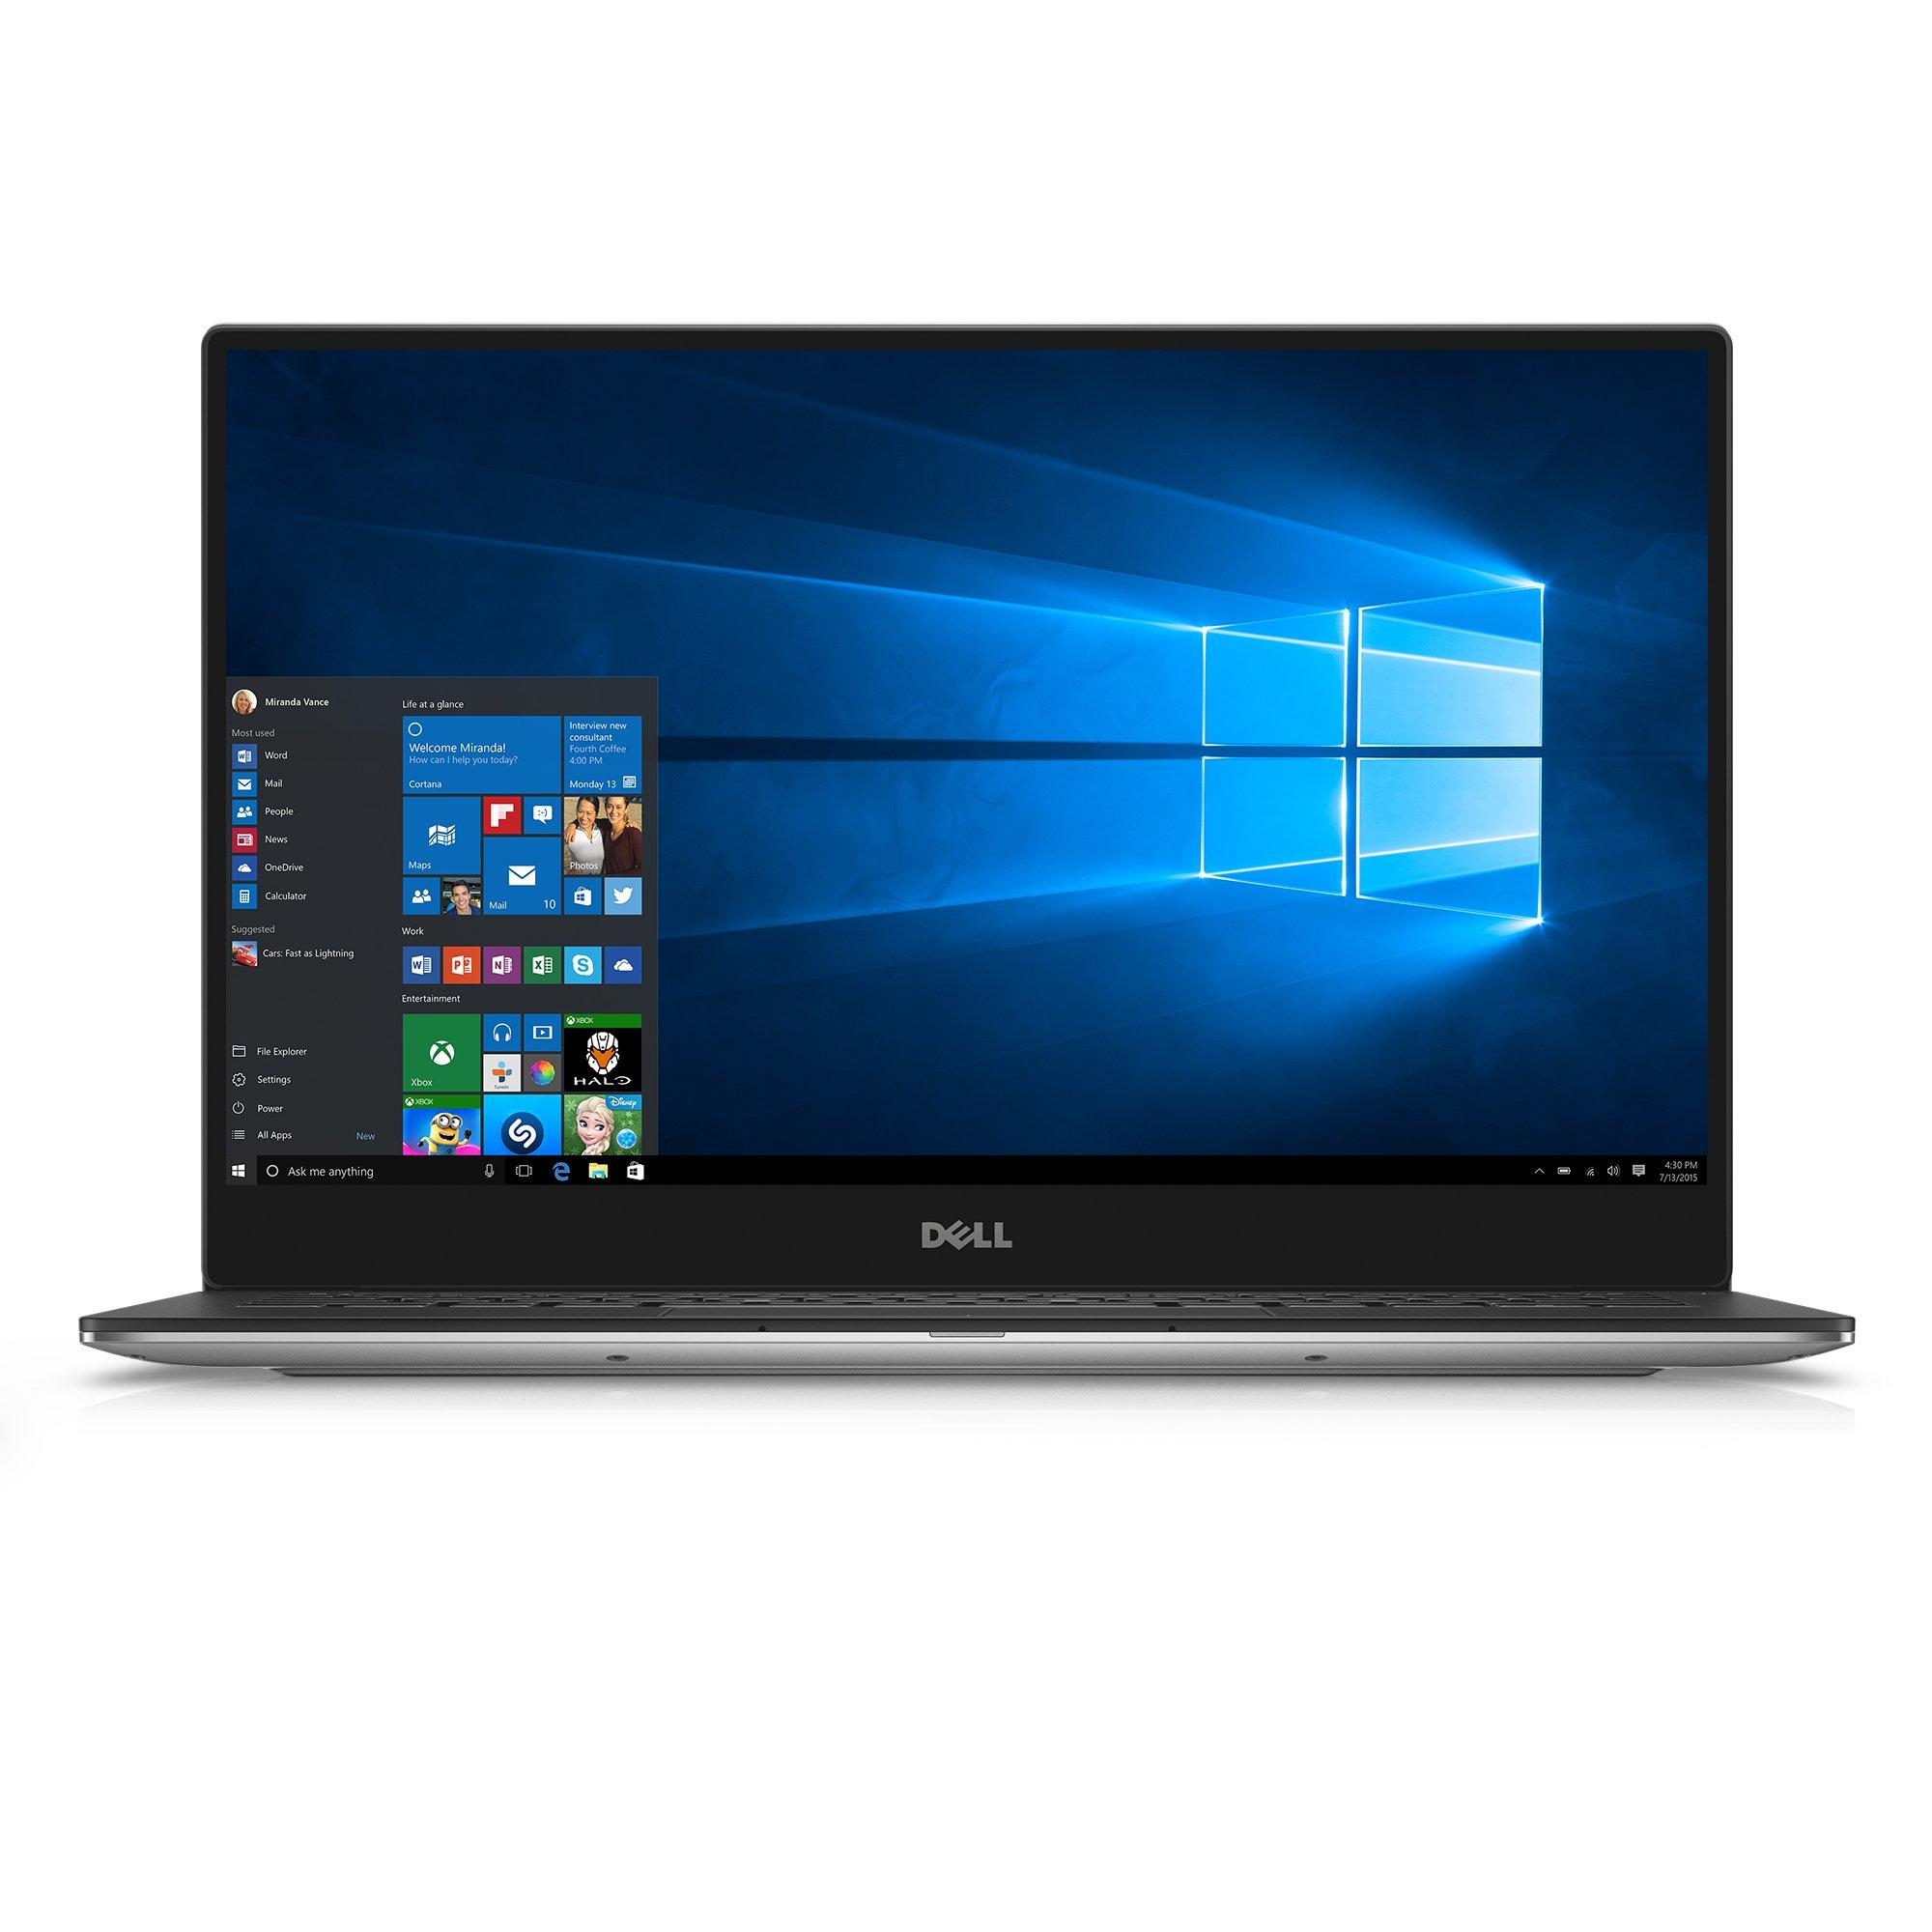 Dell XPS 9350-1340SLV 13.3 Inch Laptop (Intel Core i5, 8 GB RAM, 128 GB SSD, Silver) Microsoft Signature Image by Dell